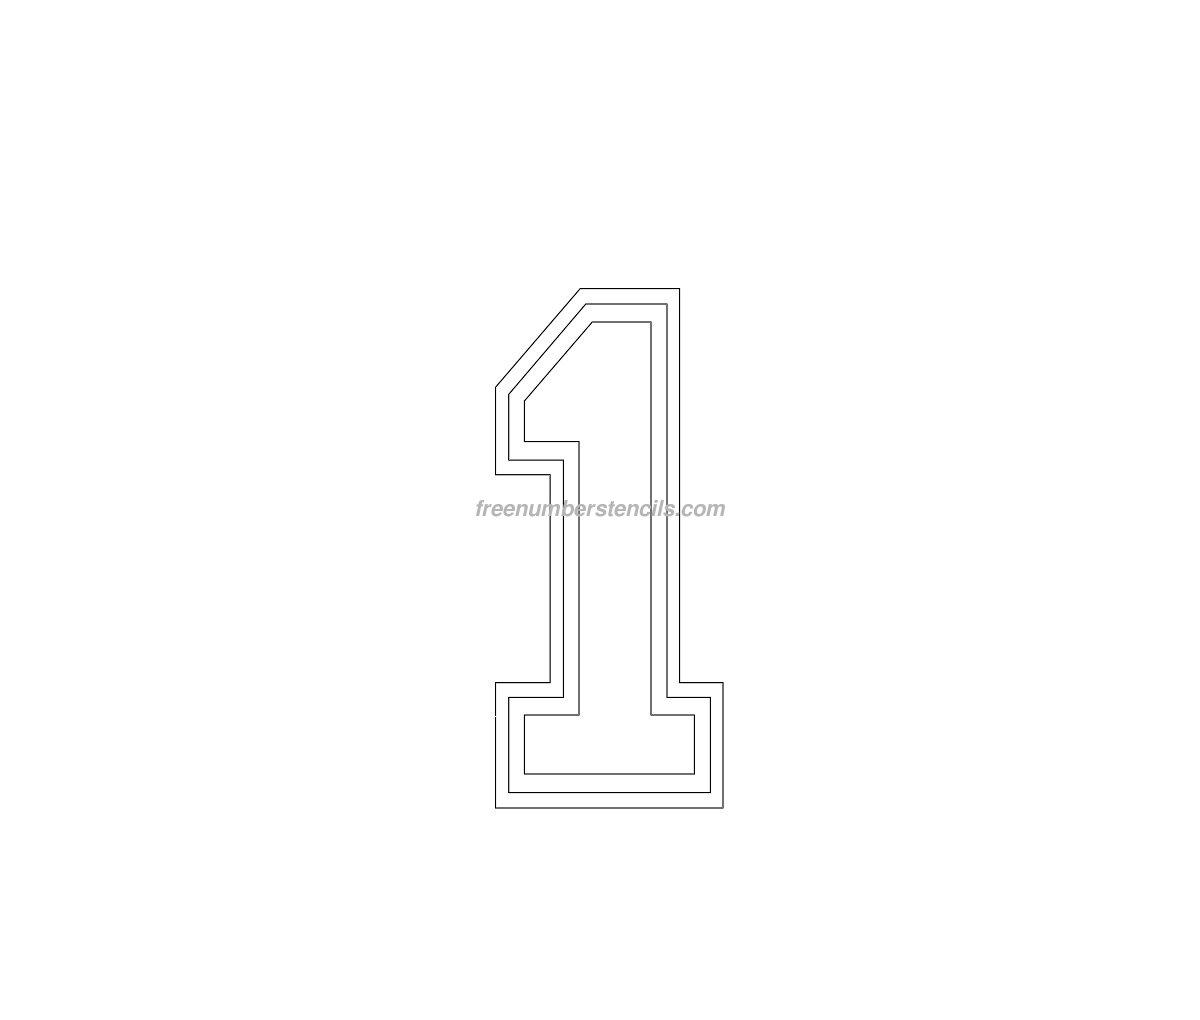 free varsity 1 number stencil